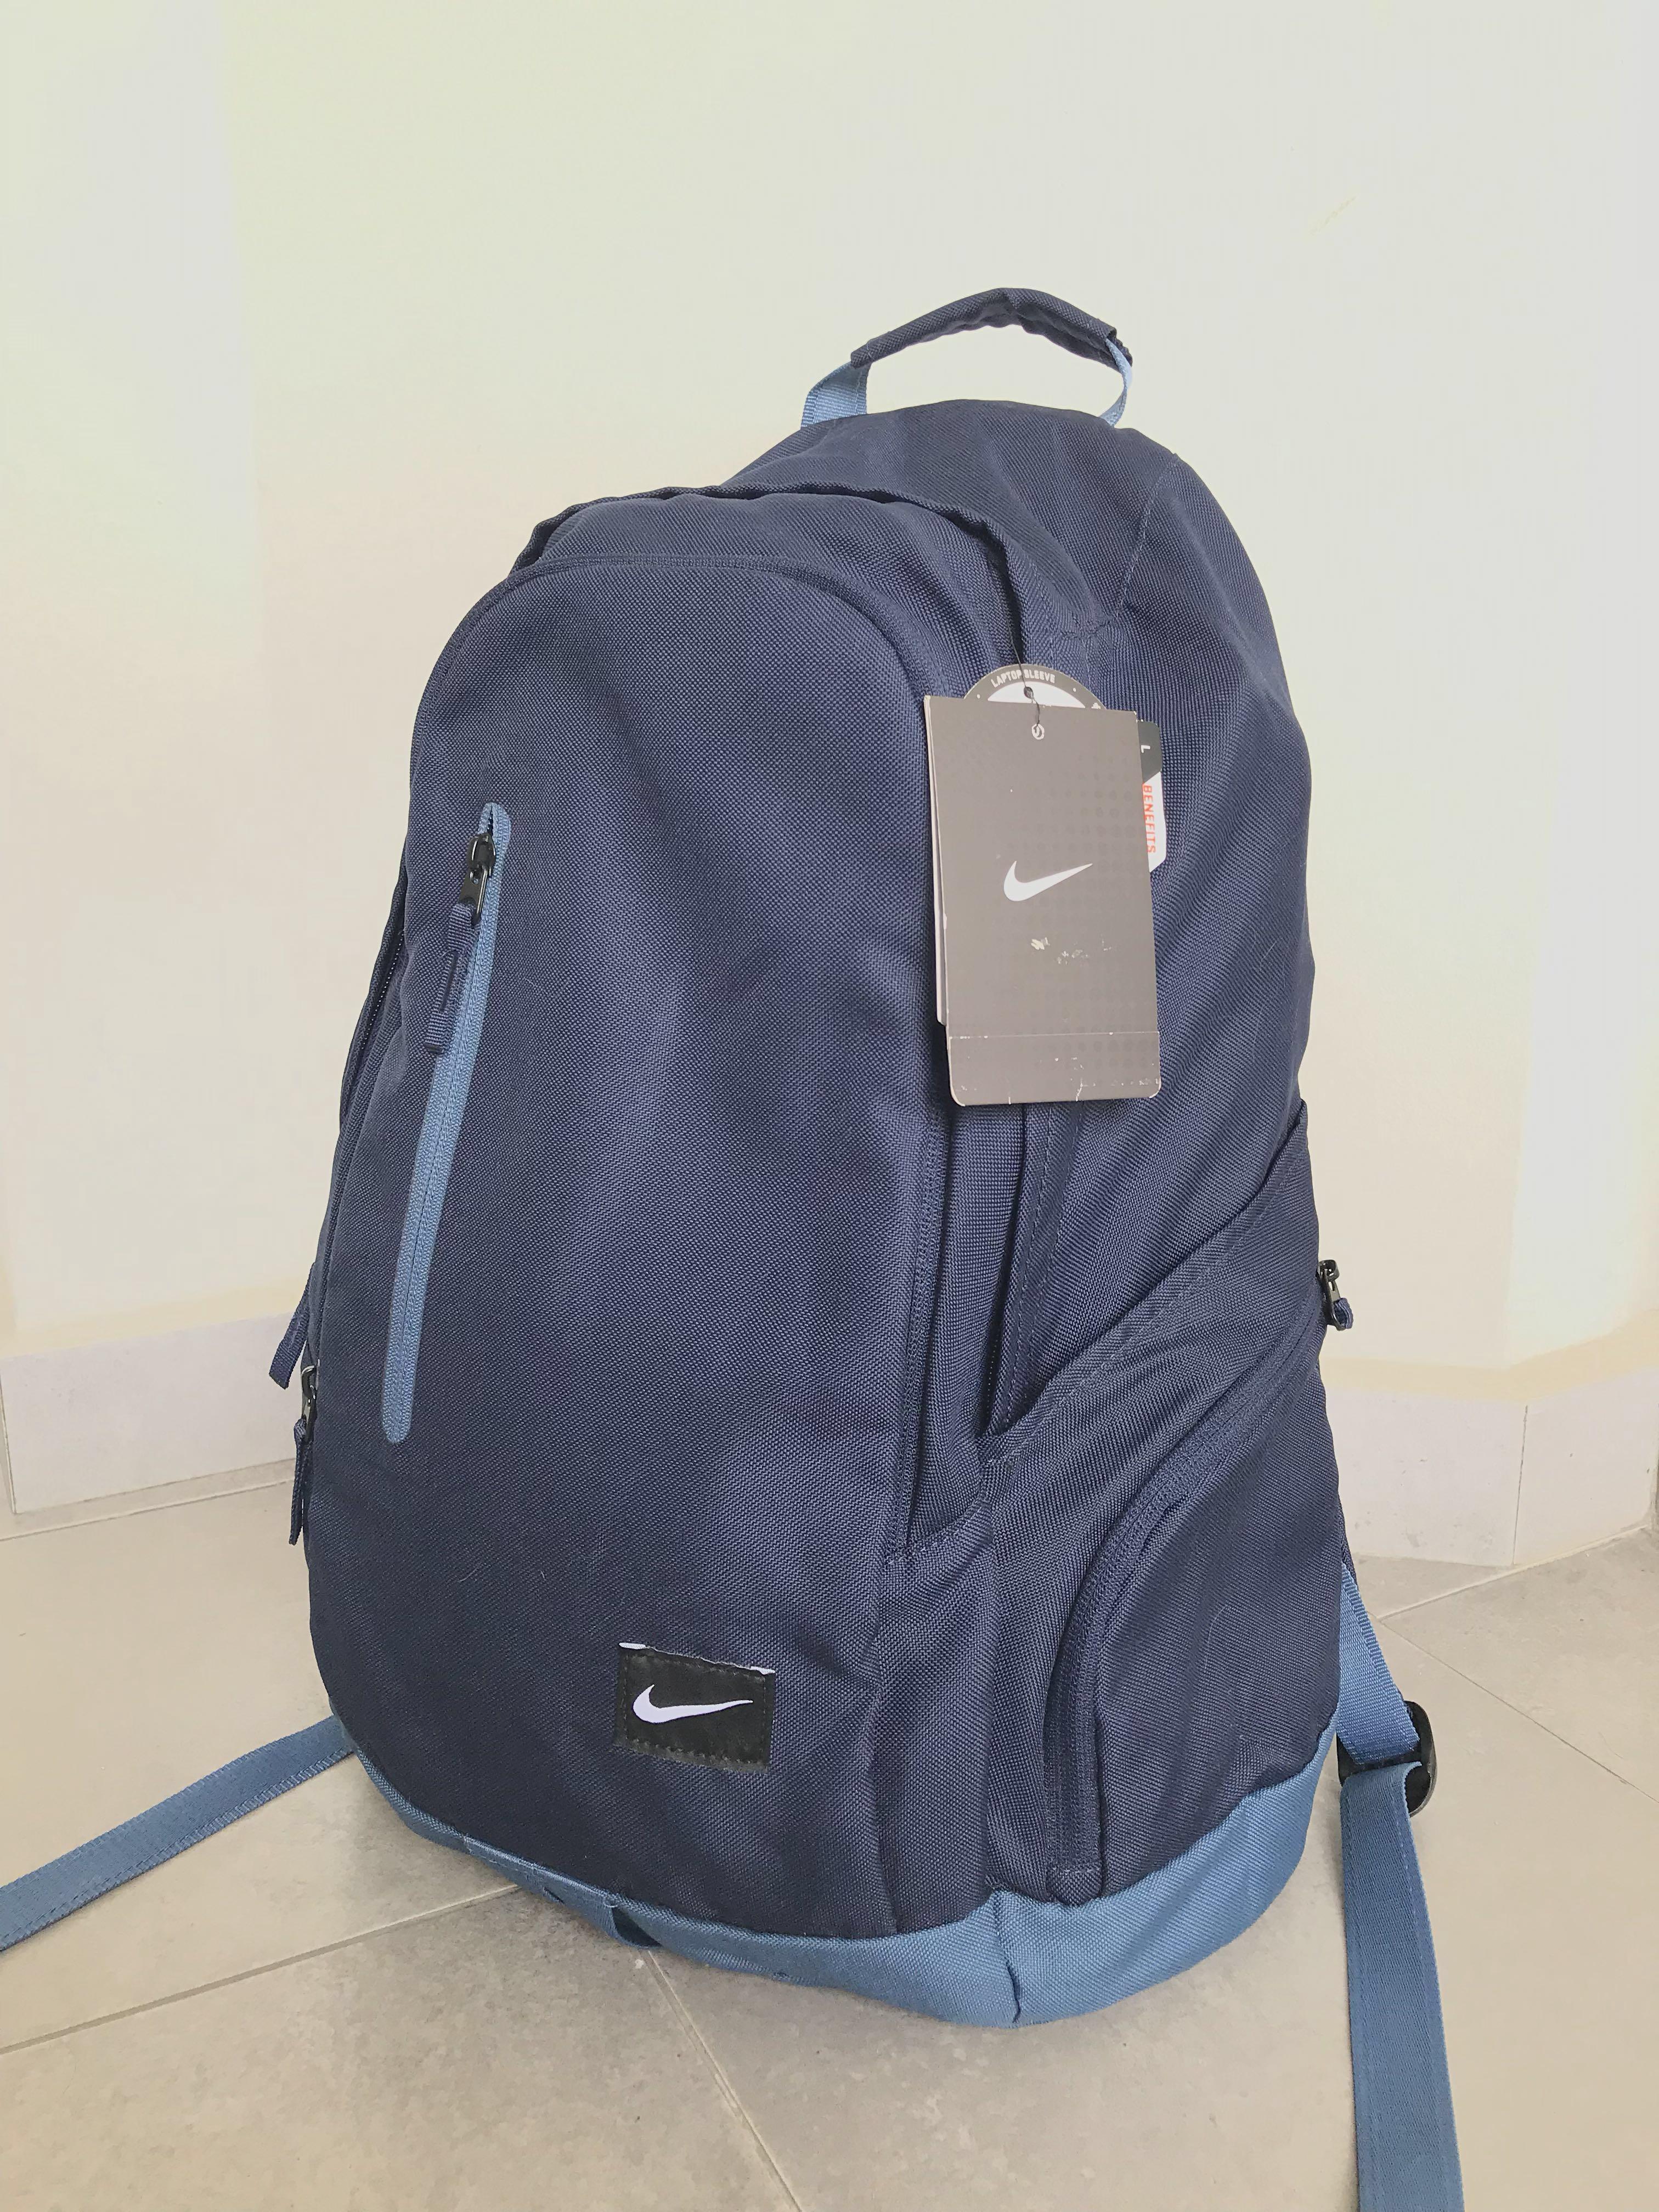 Nike Navy Blue Backpack